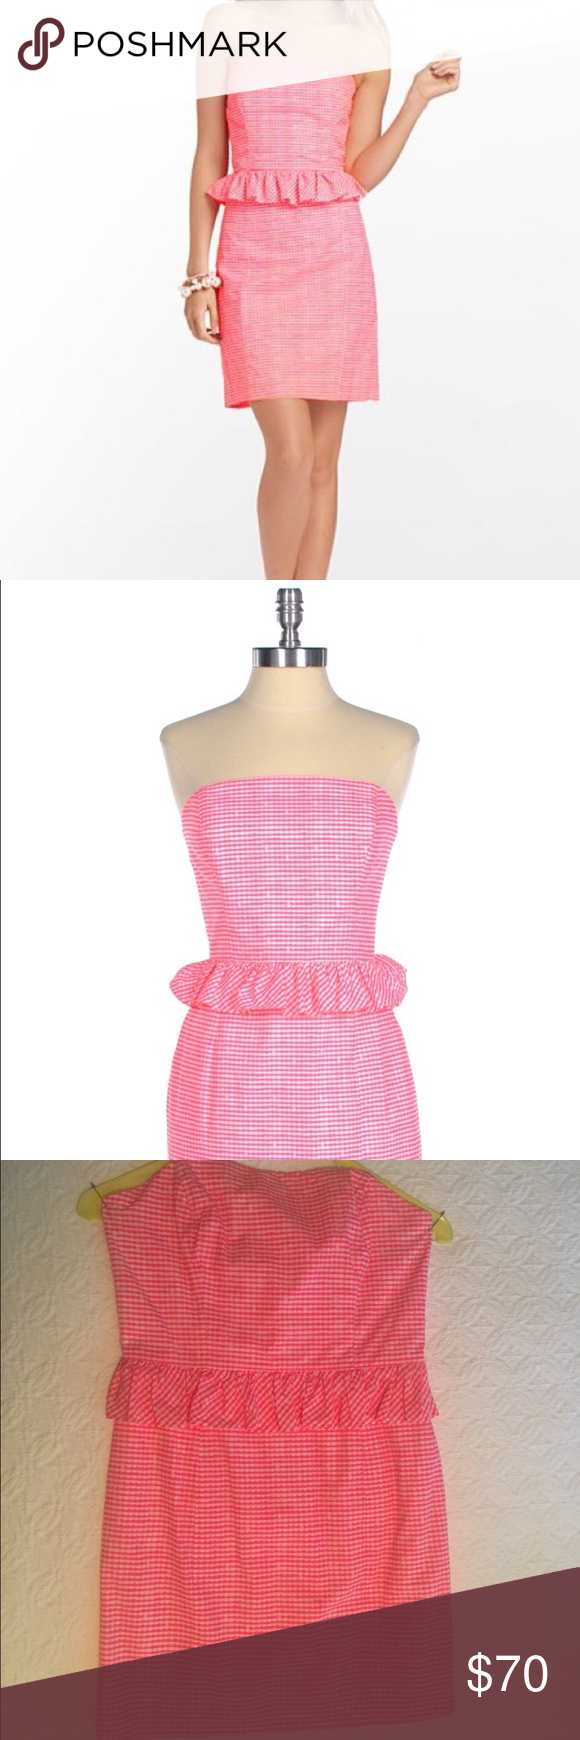 Lilly Pulitzer Pink Peplum Dress